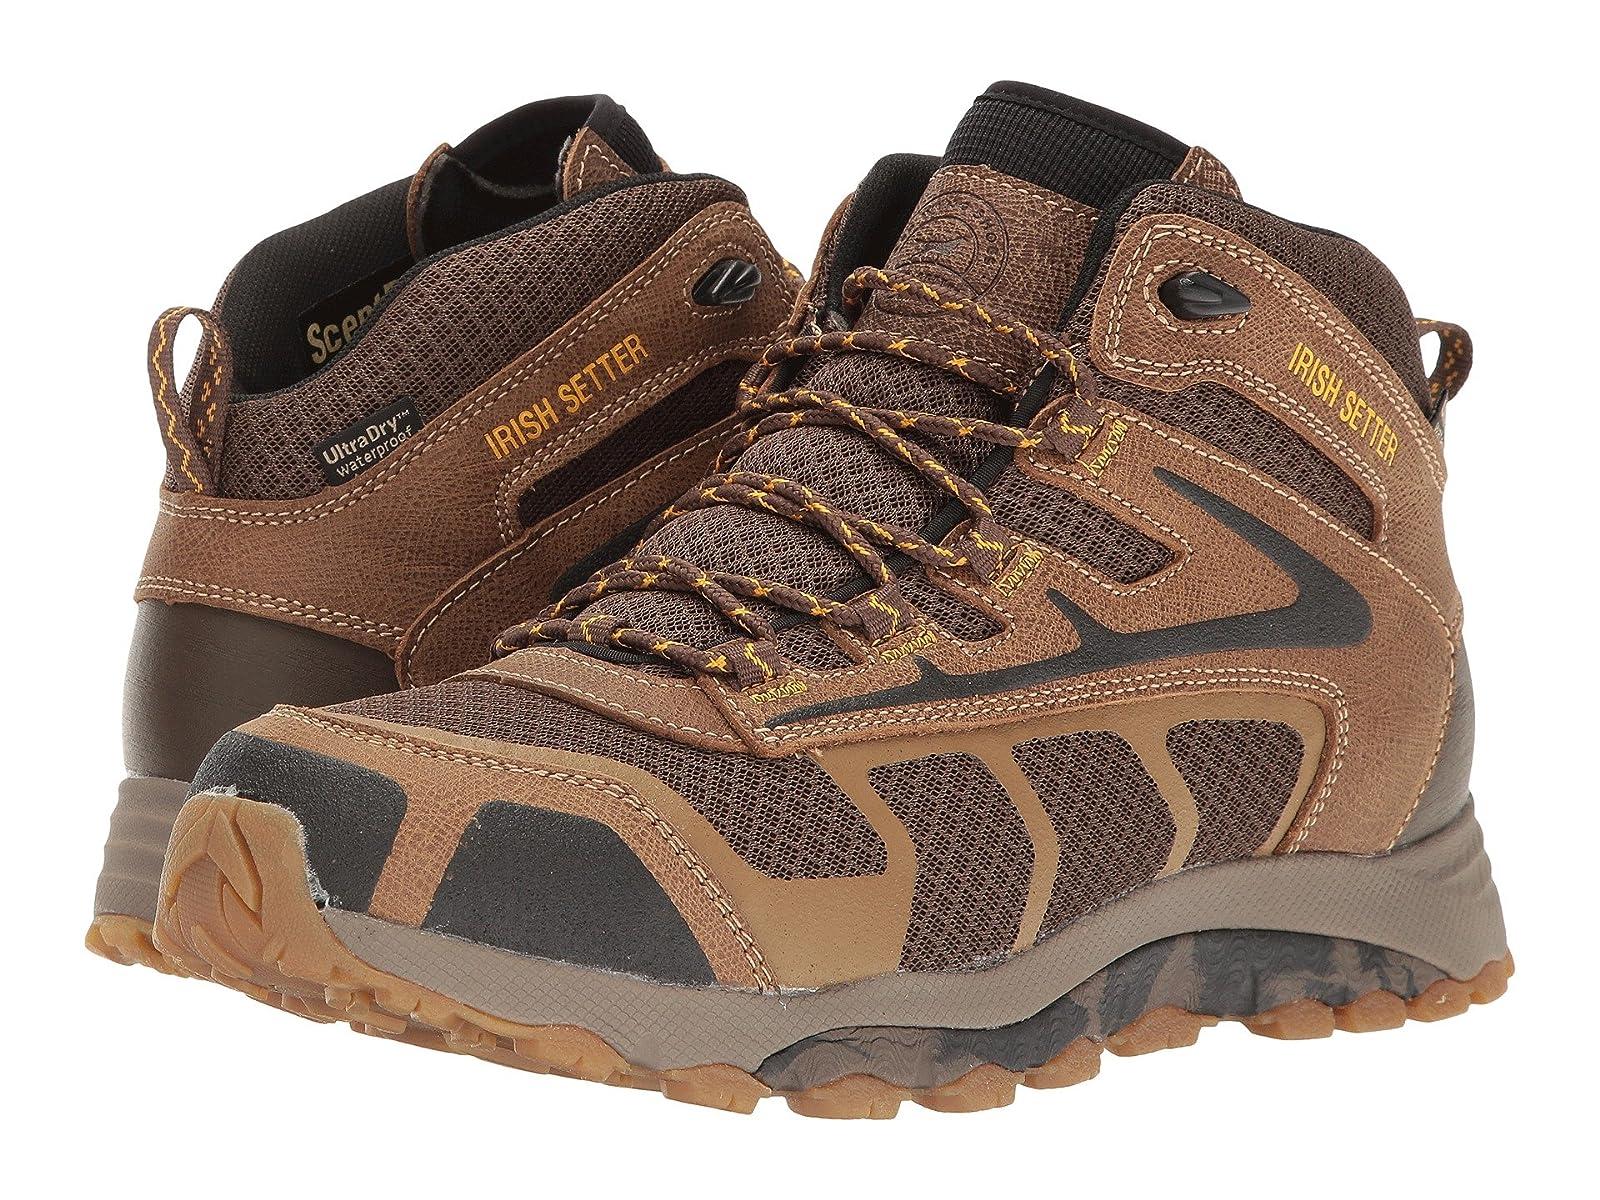 Irish Setter DrifterAffordable and distinctive shoes